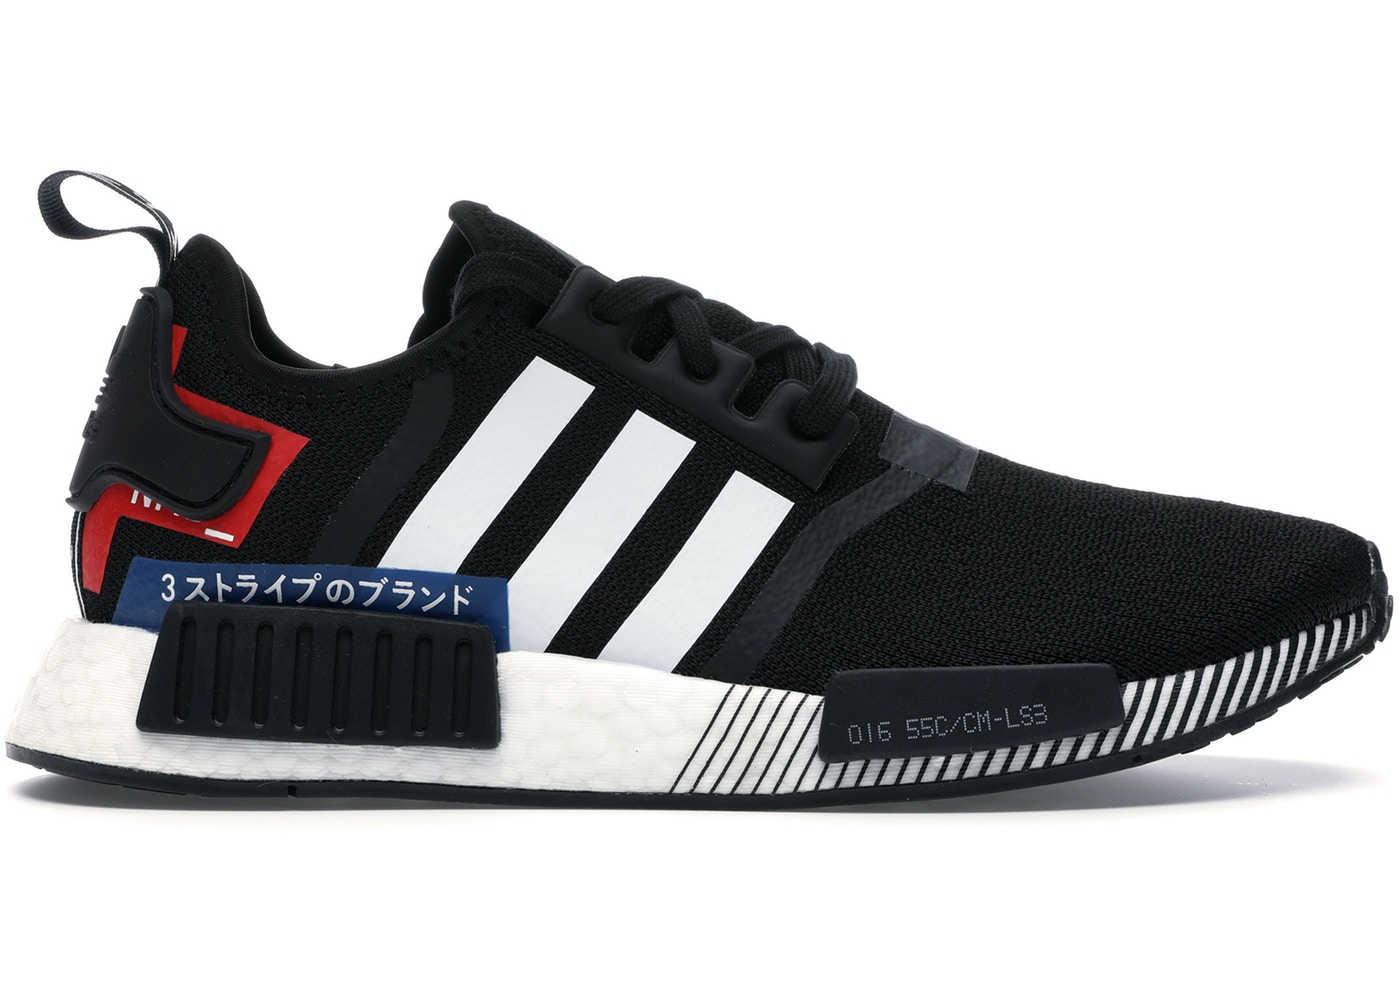 Adidas Nmd R1 Japan Pack Black White 2019 Ef2357